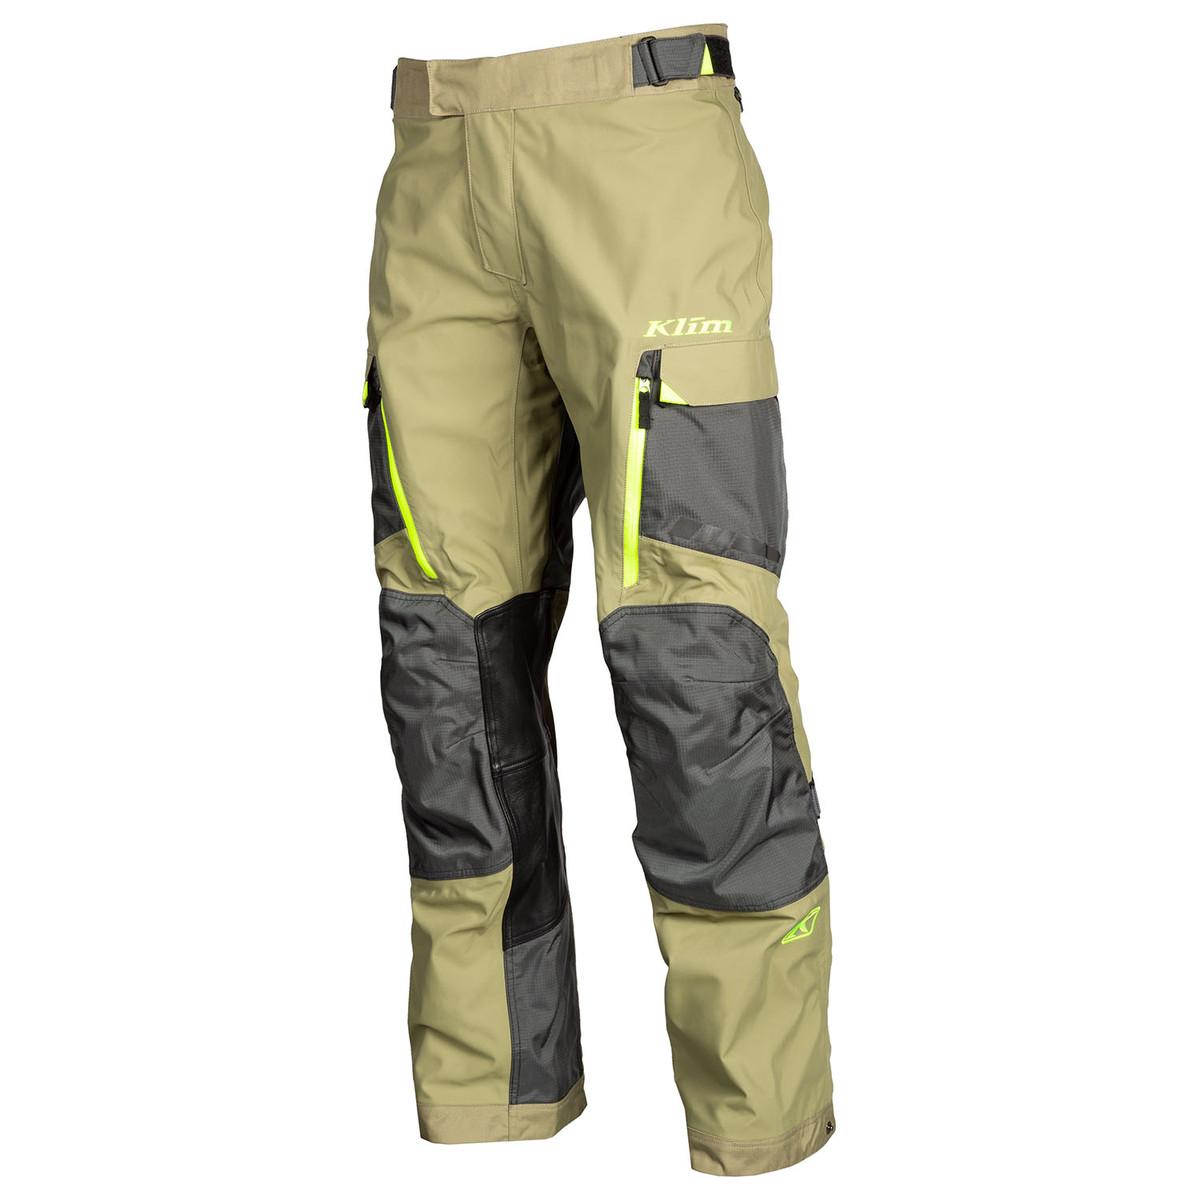 Klim Carlsbad Pantalon De Moto Sage Haute-Visibilite 36